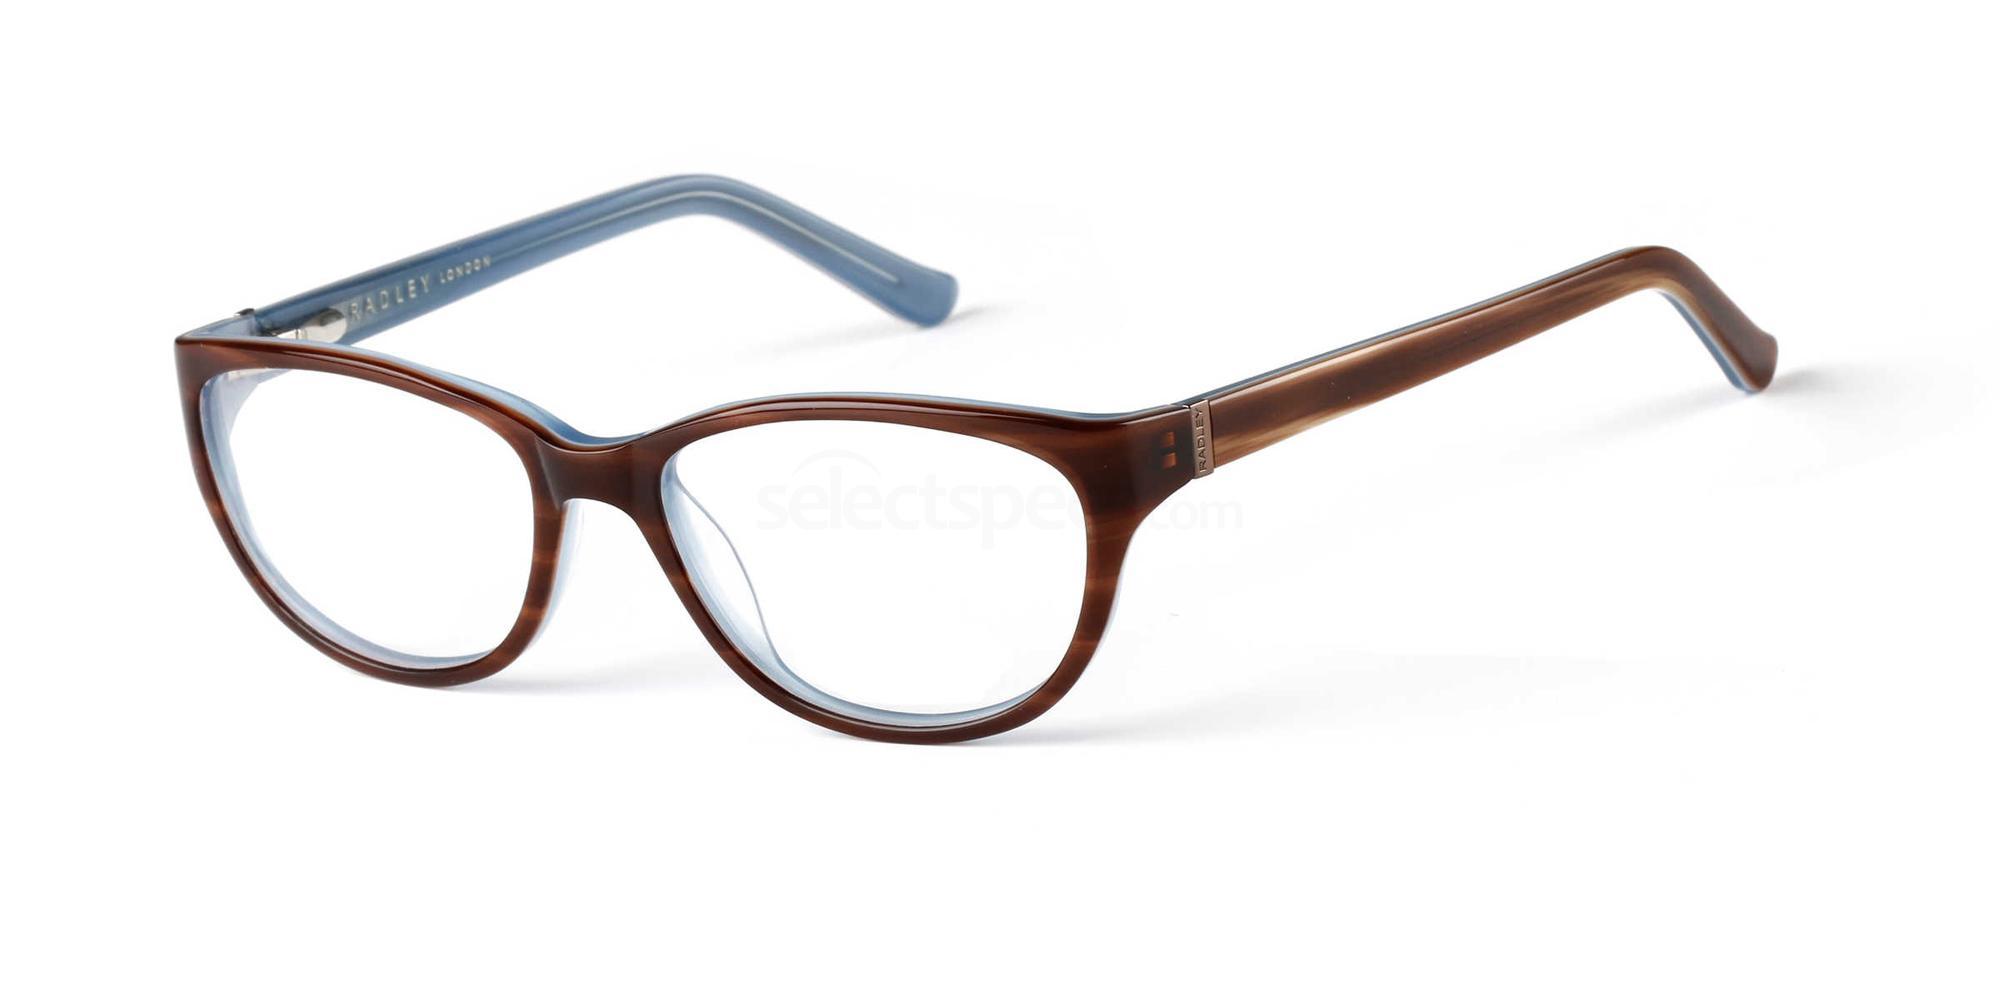 101 RDO-15515 Glasses, Radley London